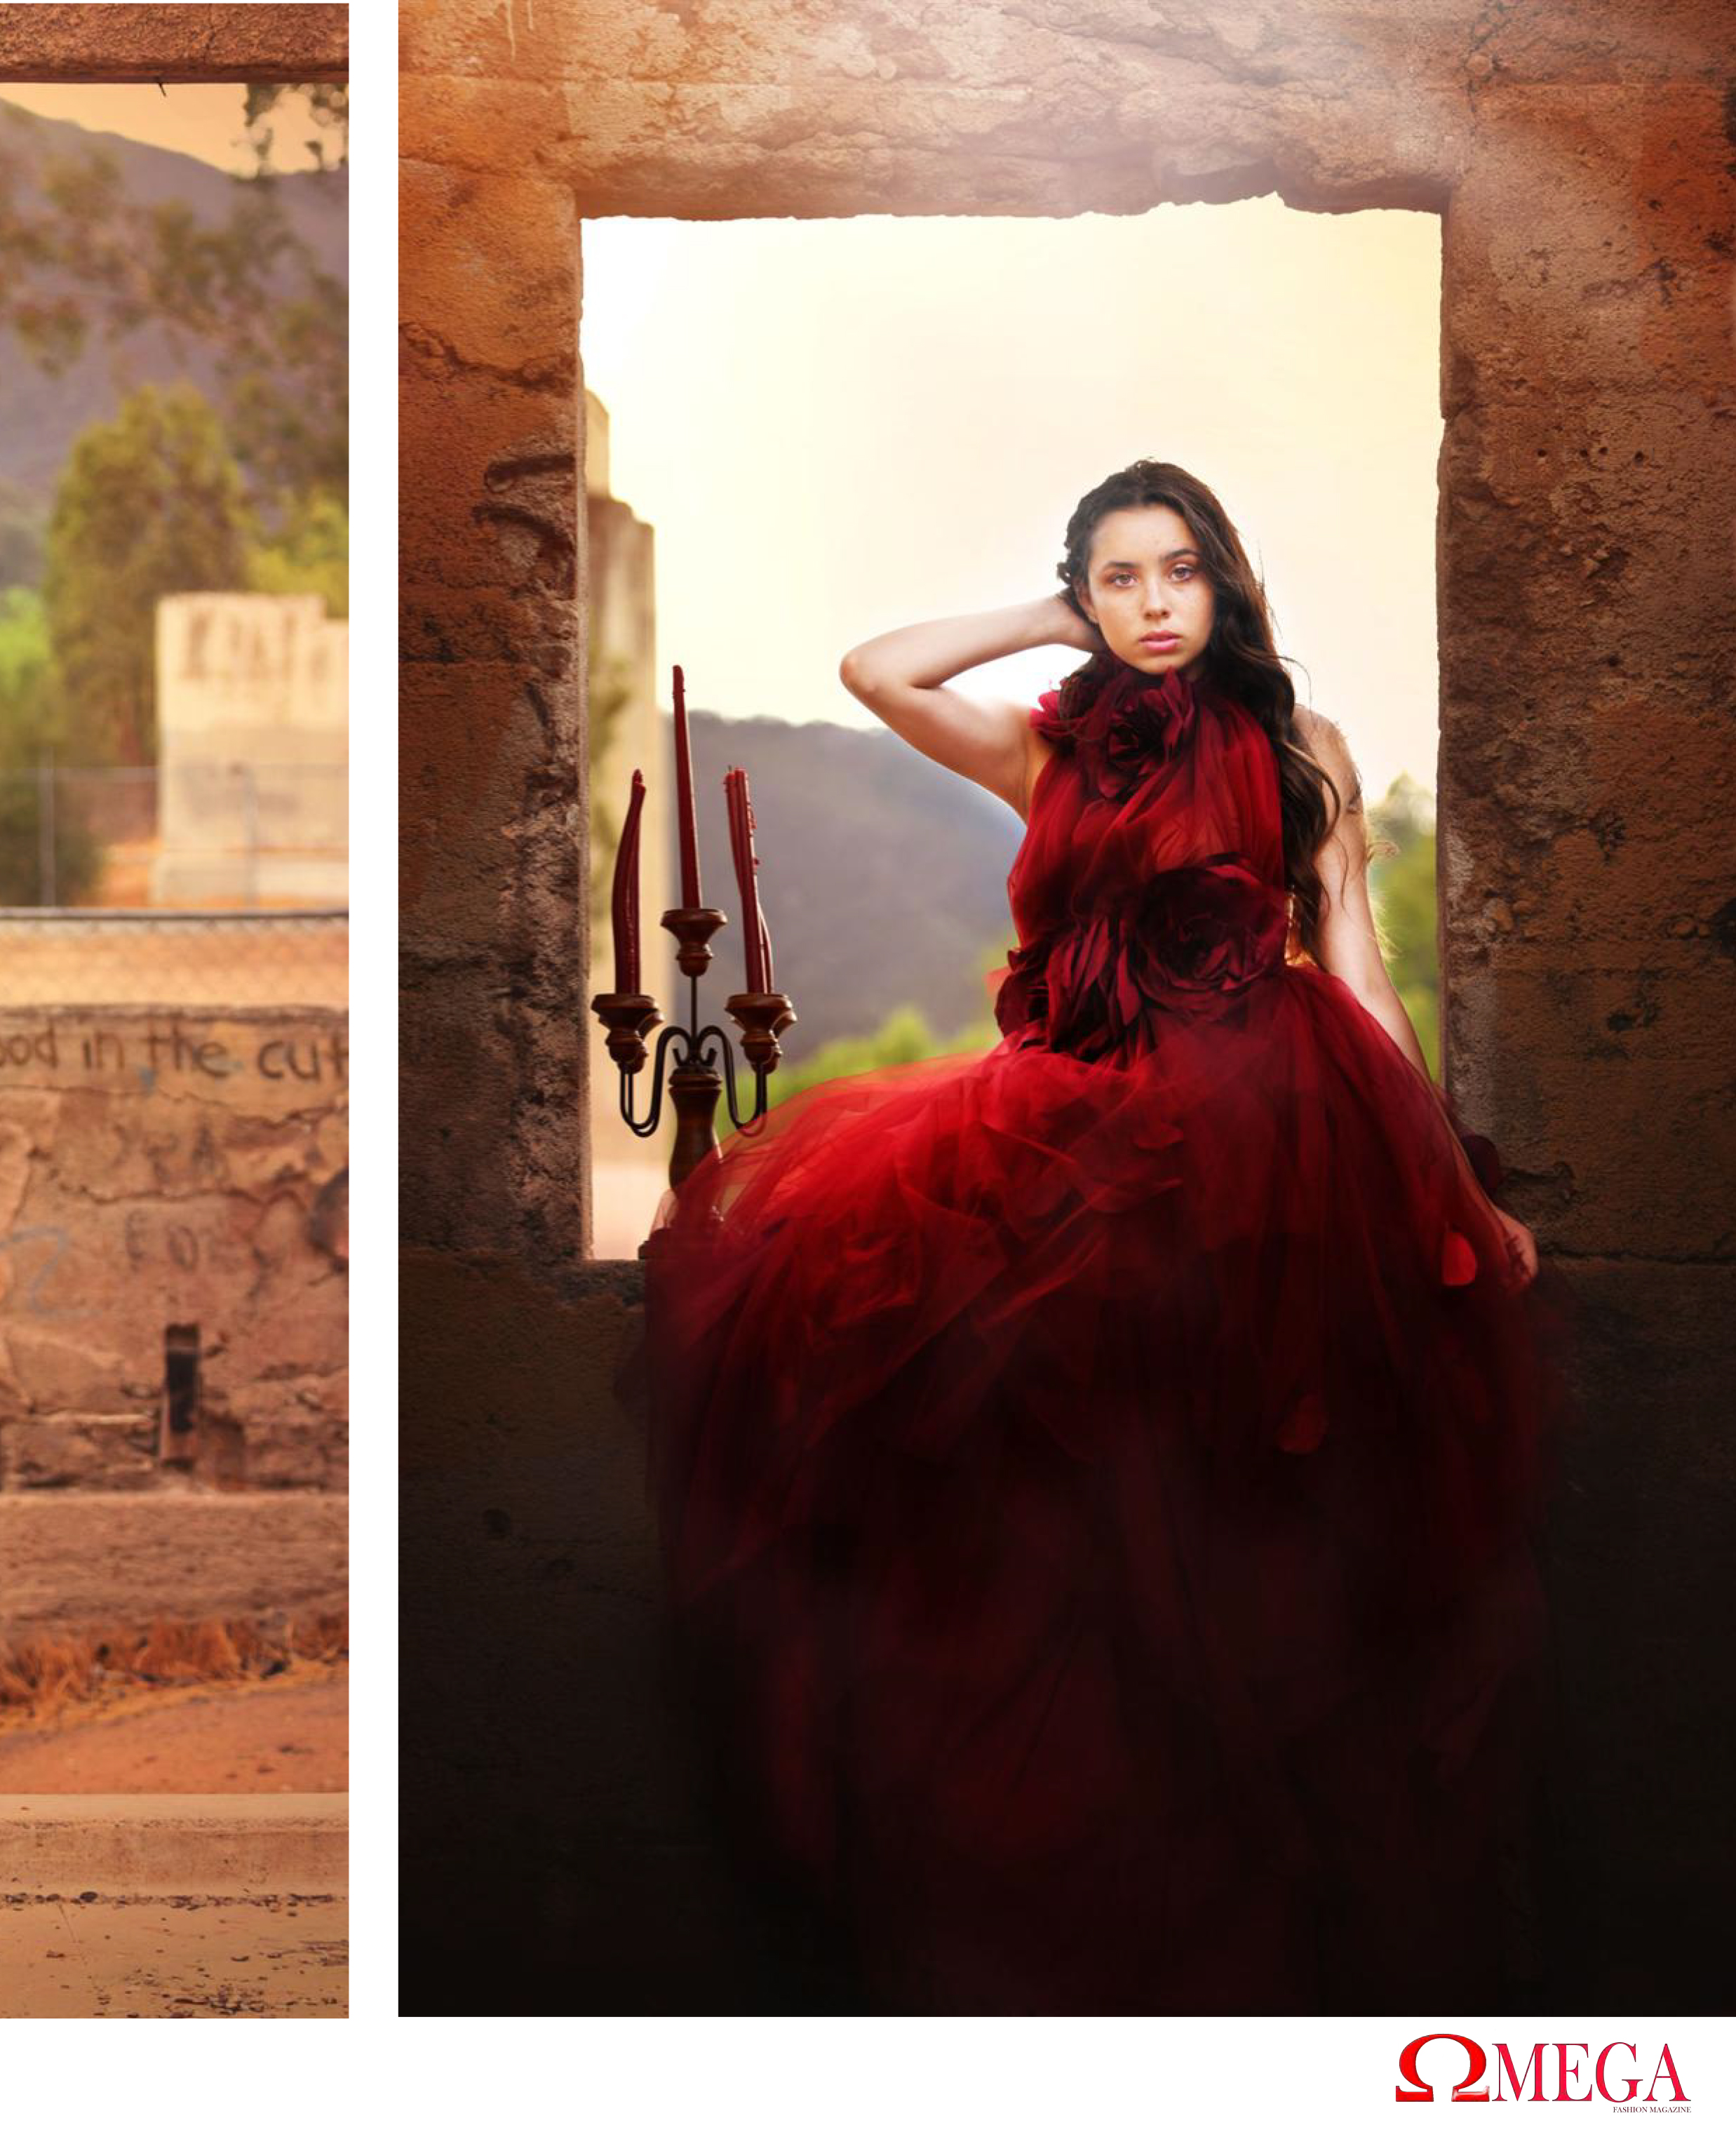 Omega_Fashion_Magazine_ 9 page 93.jpg